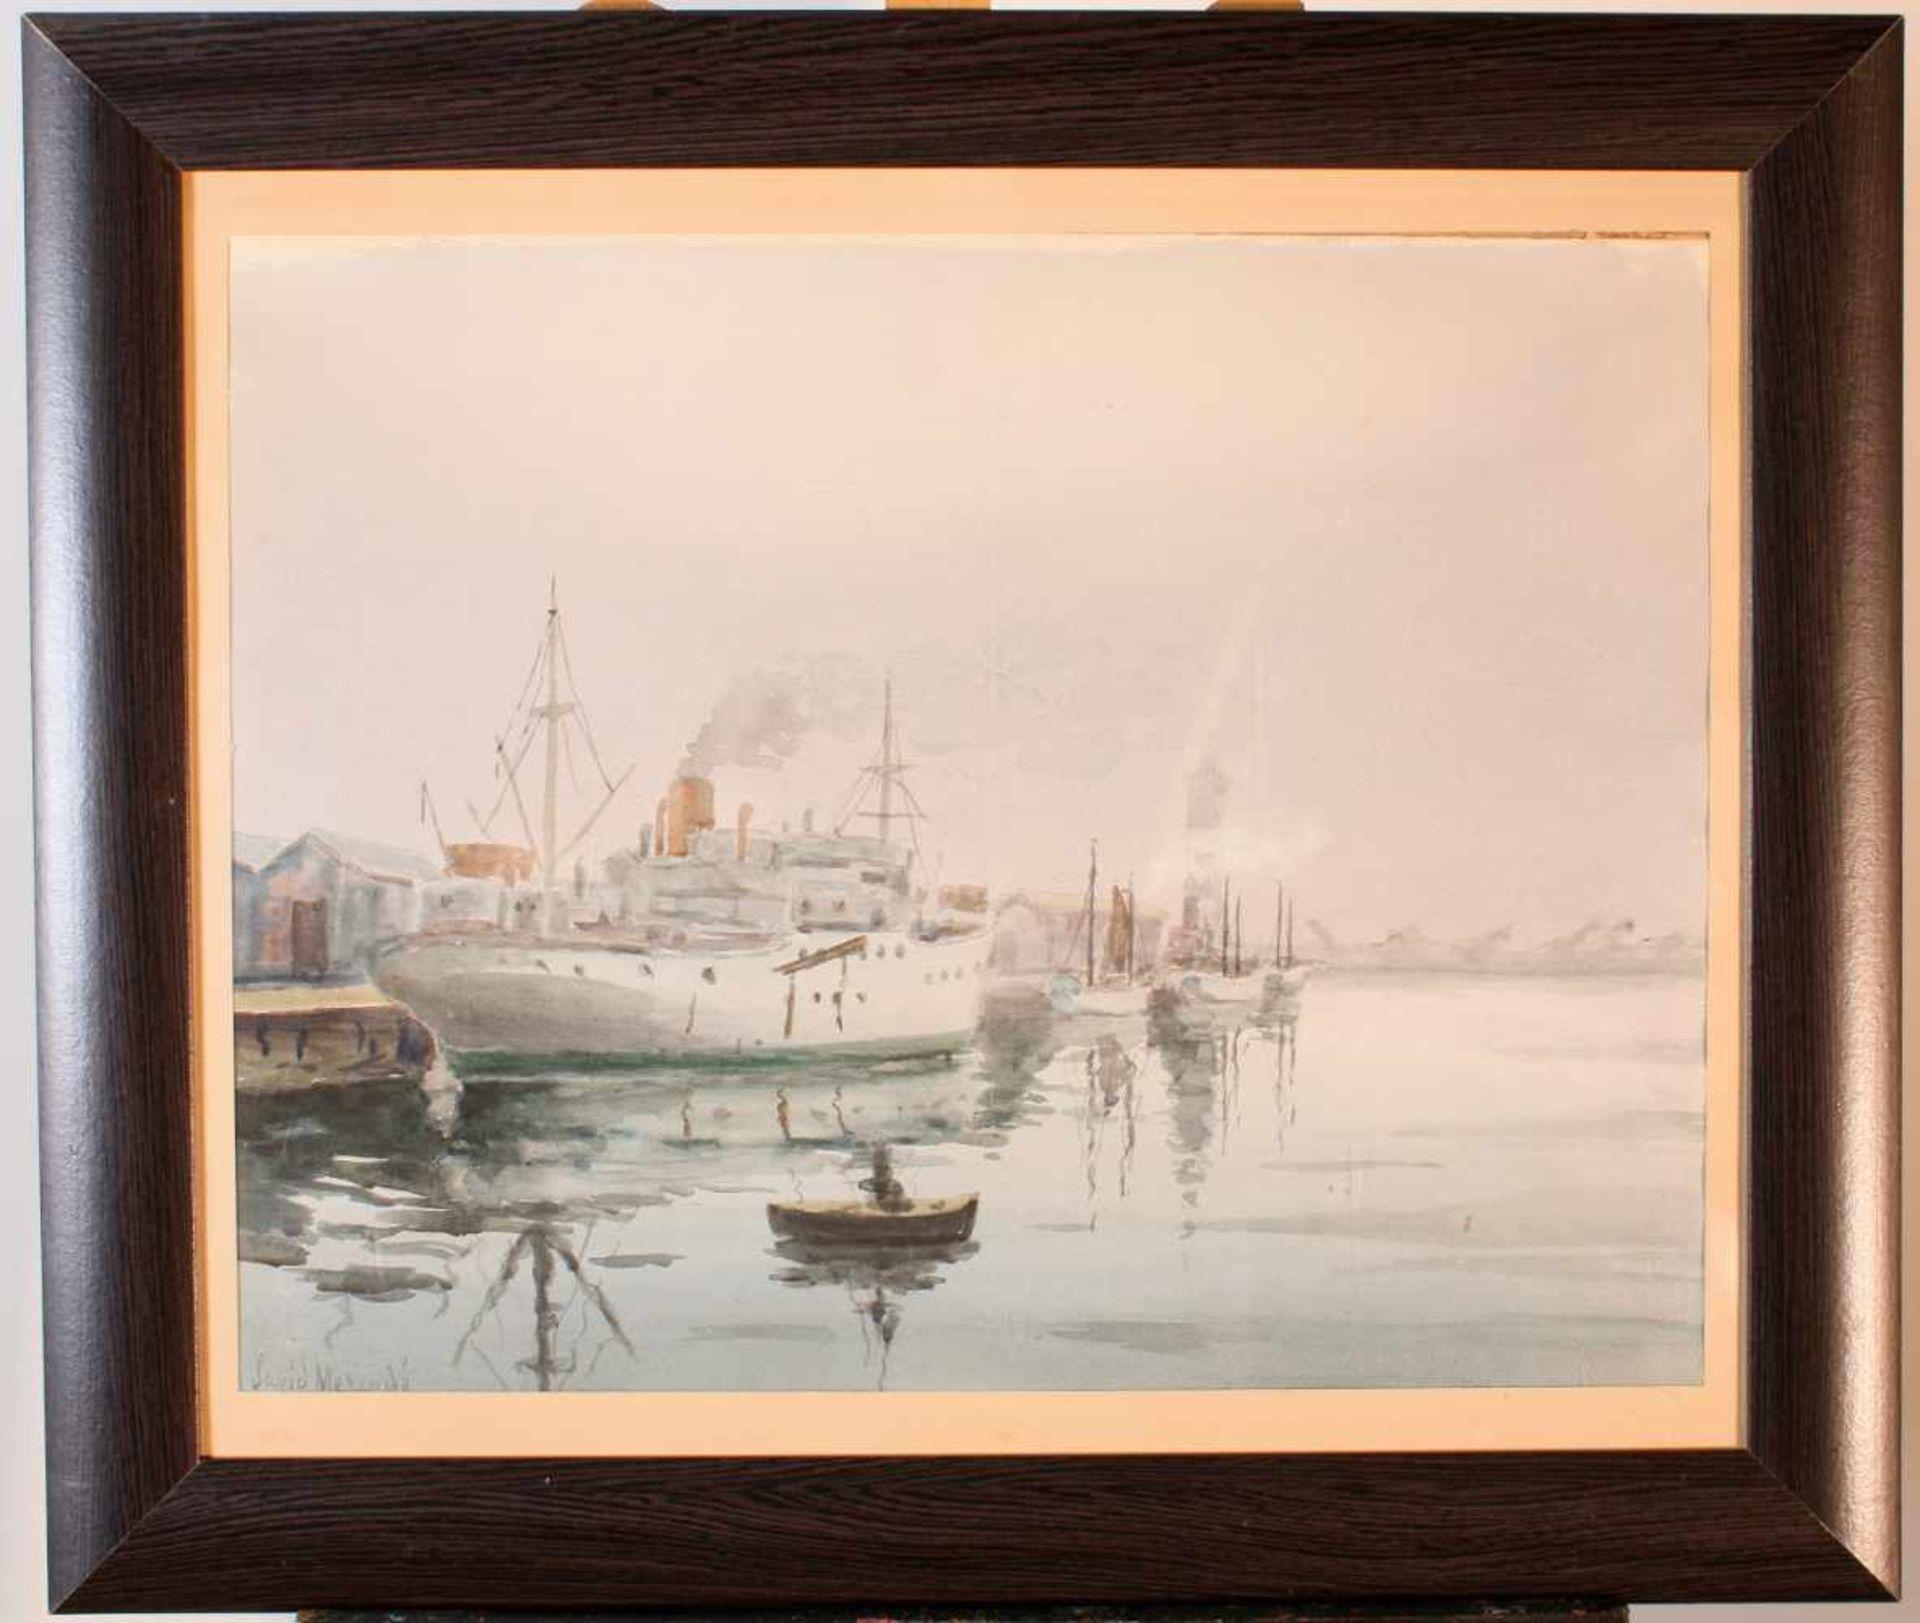 """Dampfer im Hafen"" - David Mercadé Recasens (20. Jahrhundert)Aquarell auf Papier, unten links - Bild 2 aus 3"